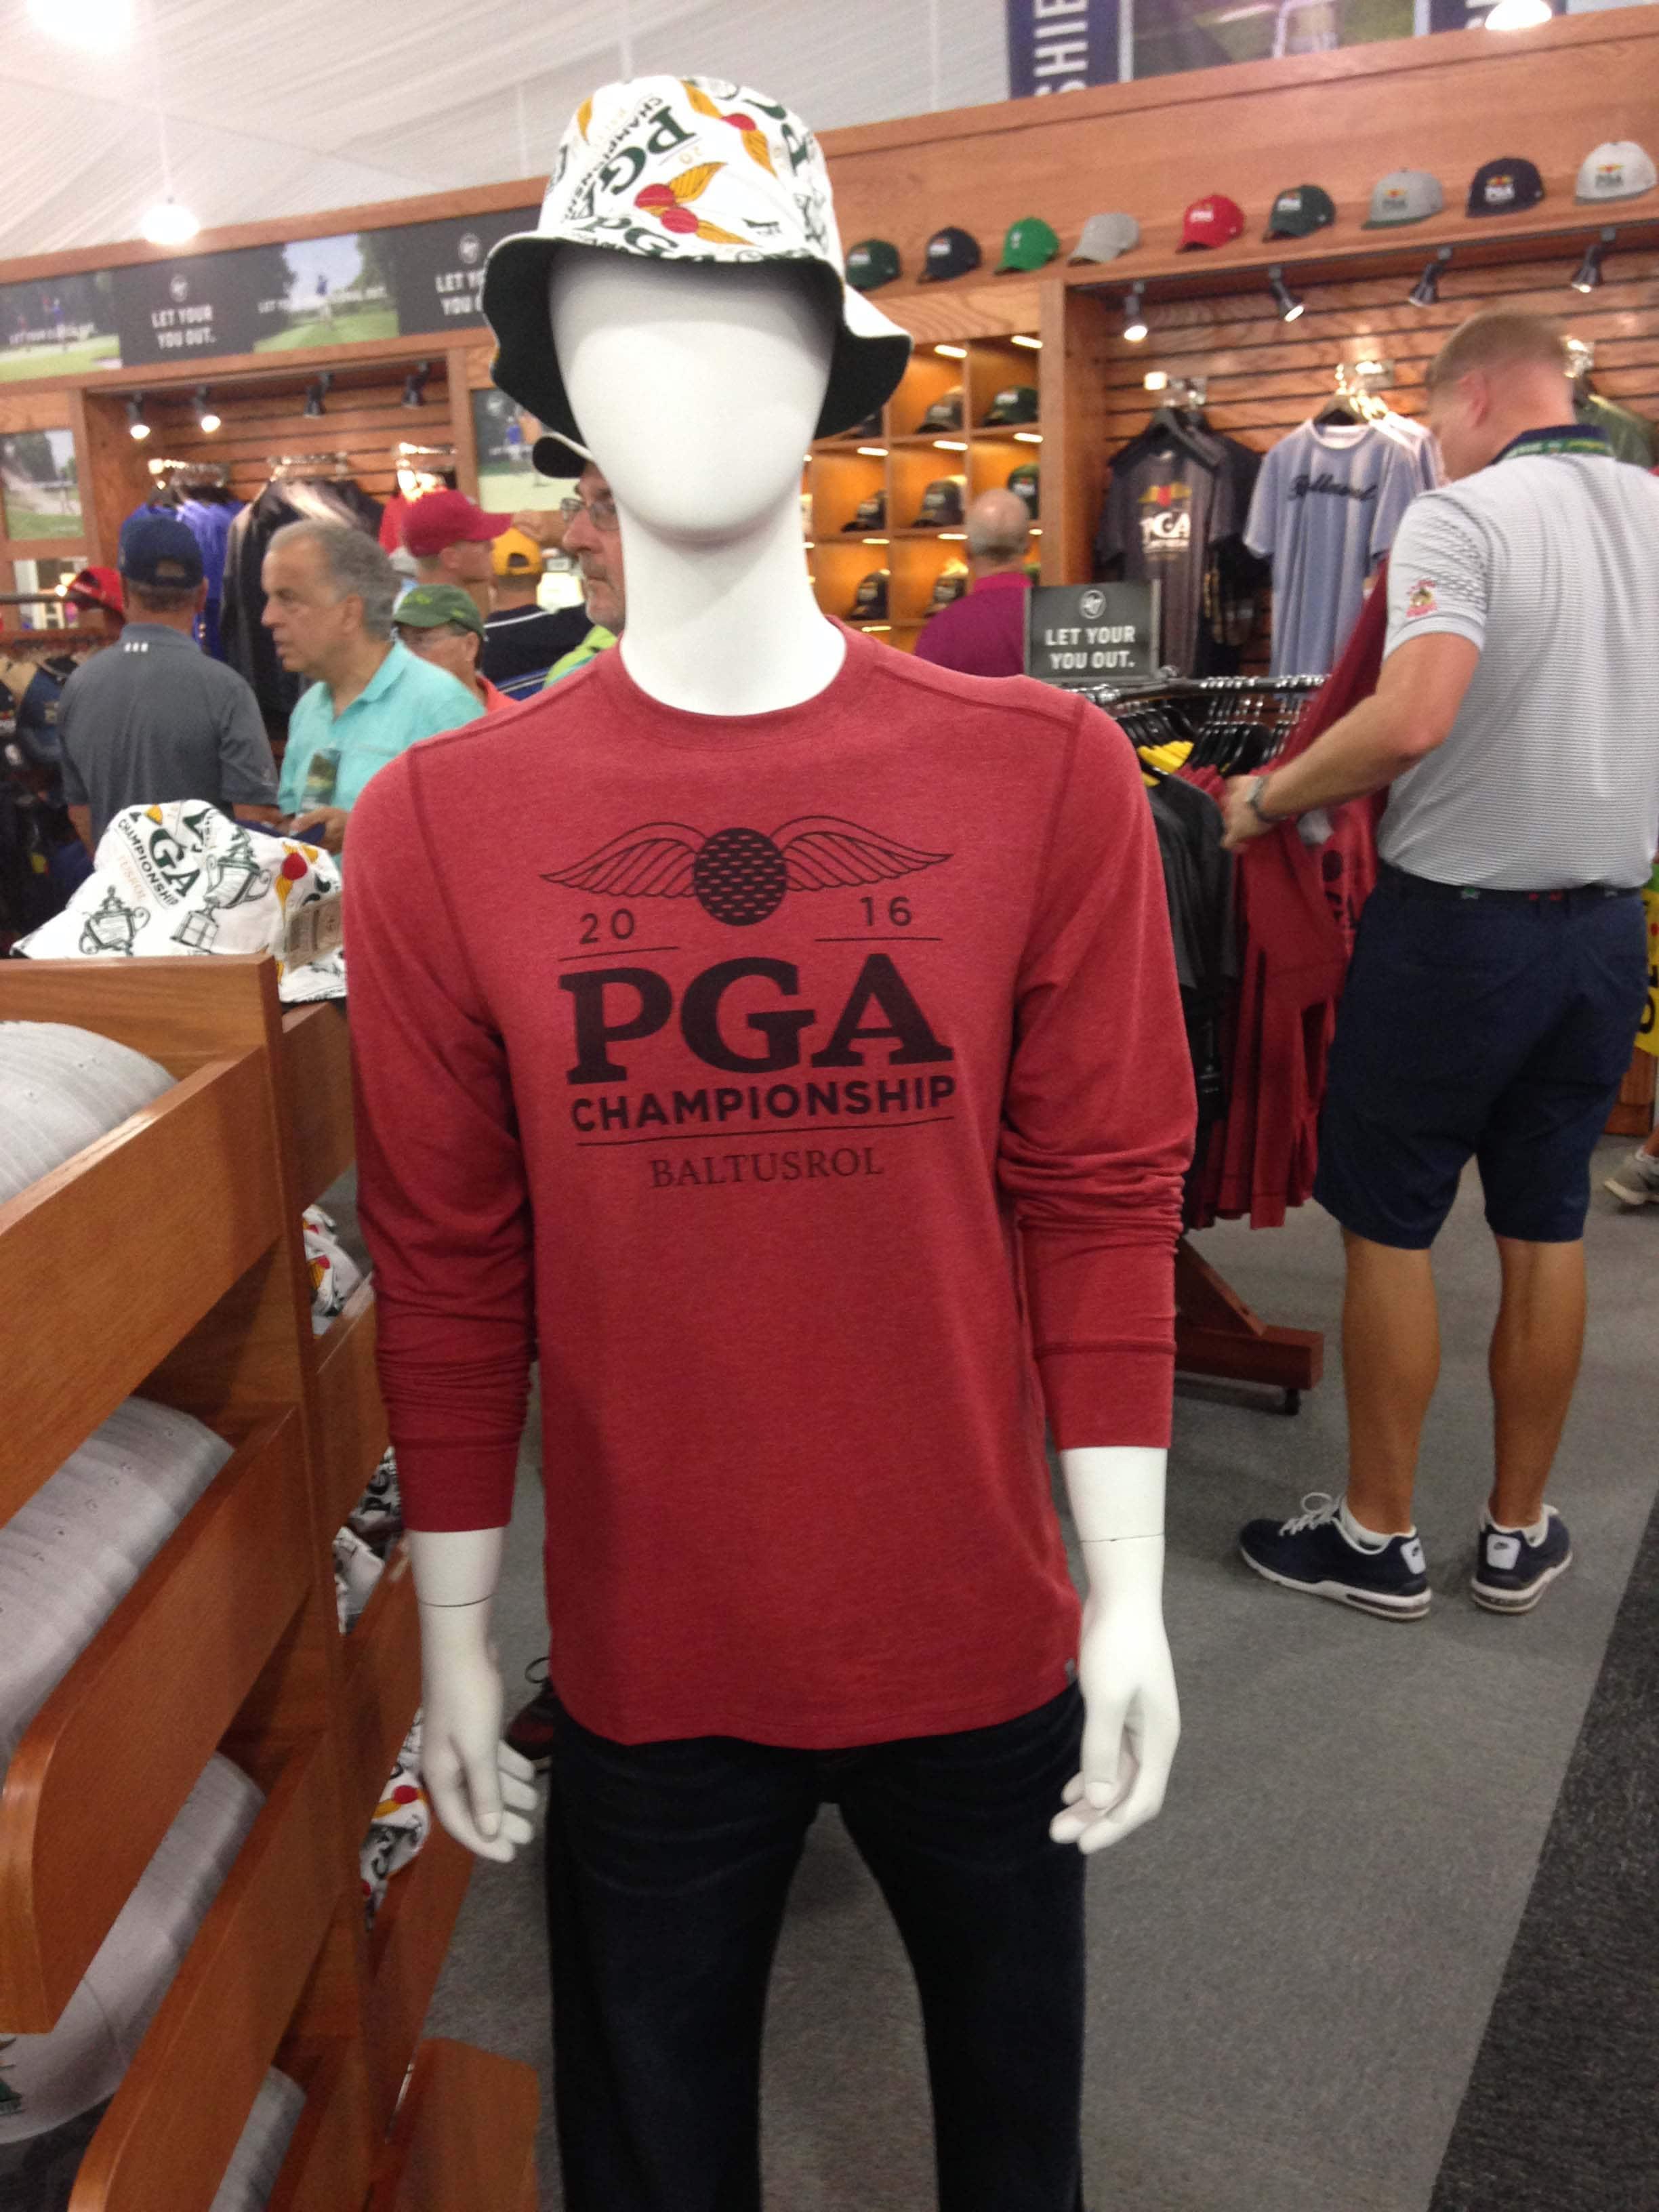 Gilligan's Island PGA ensemble